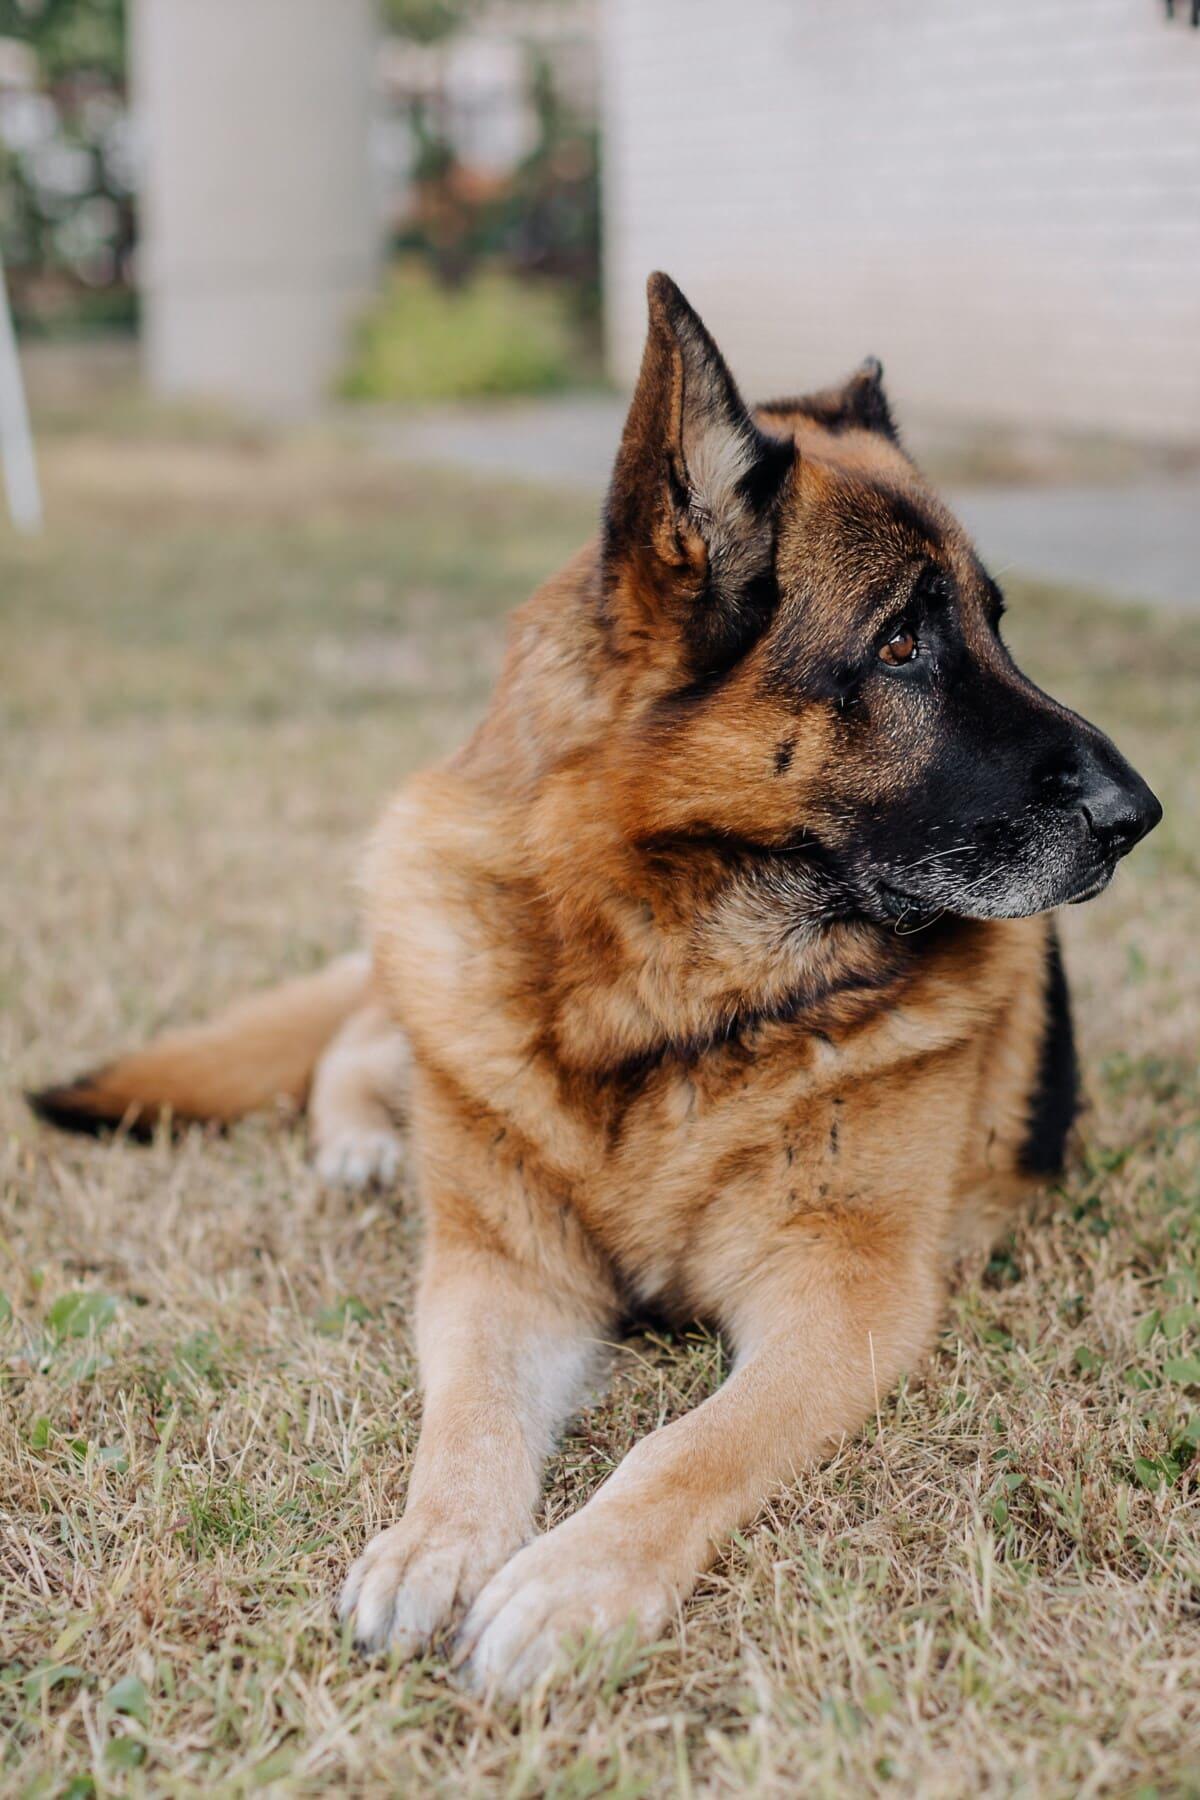 german, shepherd dog, portrait, muzzle, laying, head, pet, dog, cute, animal